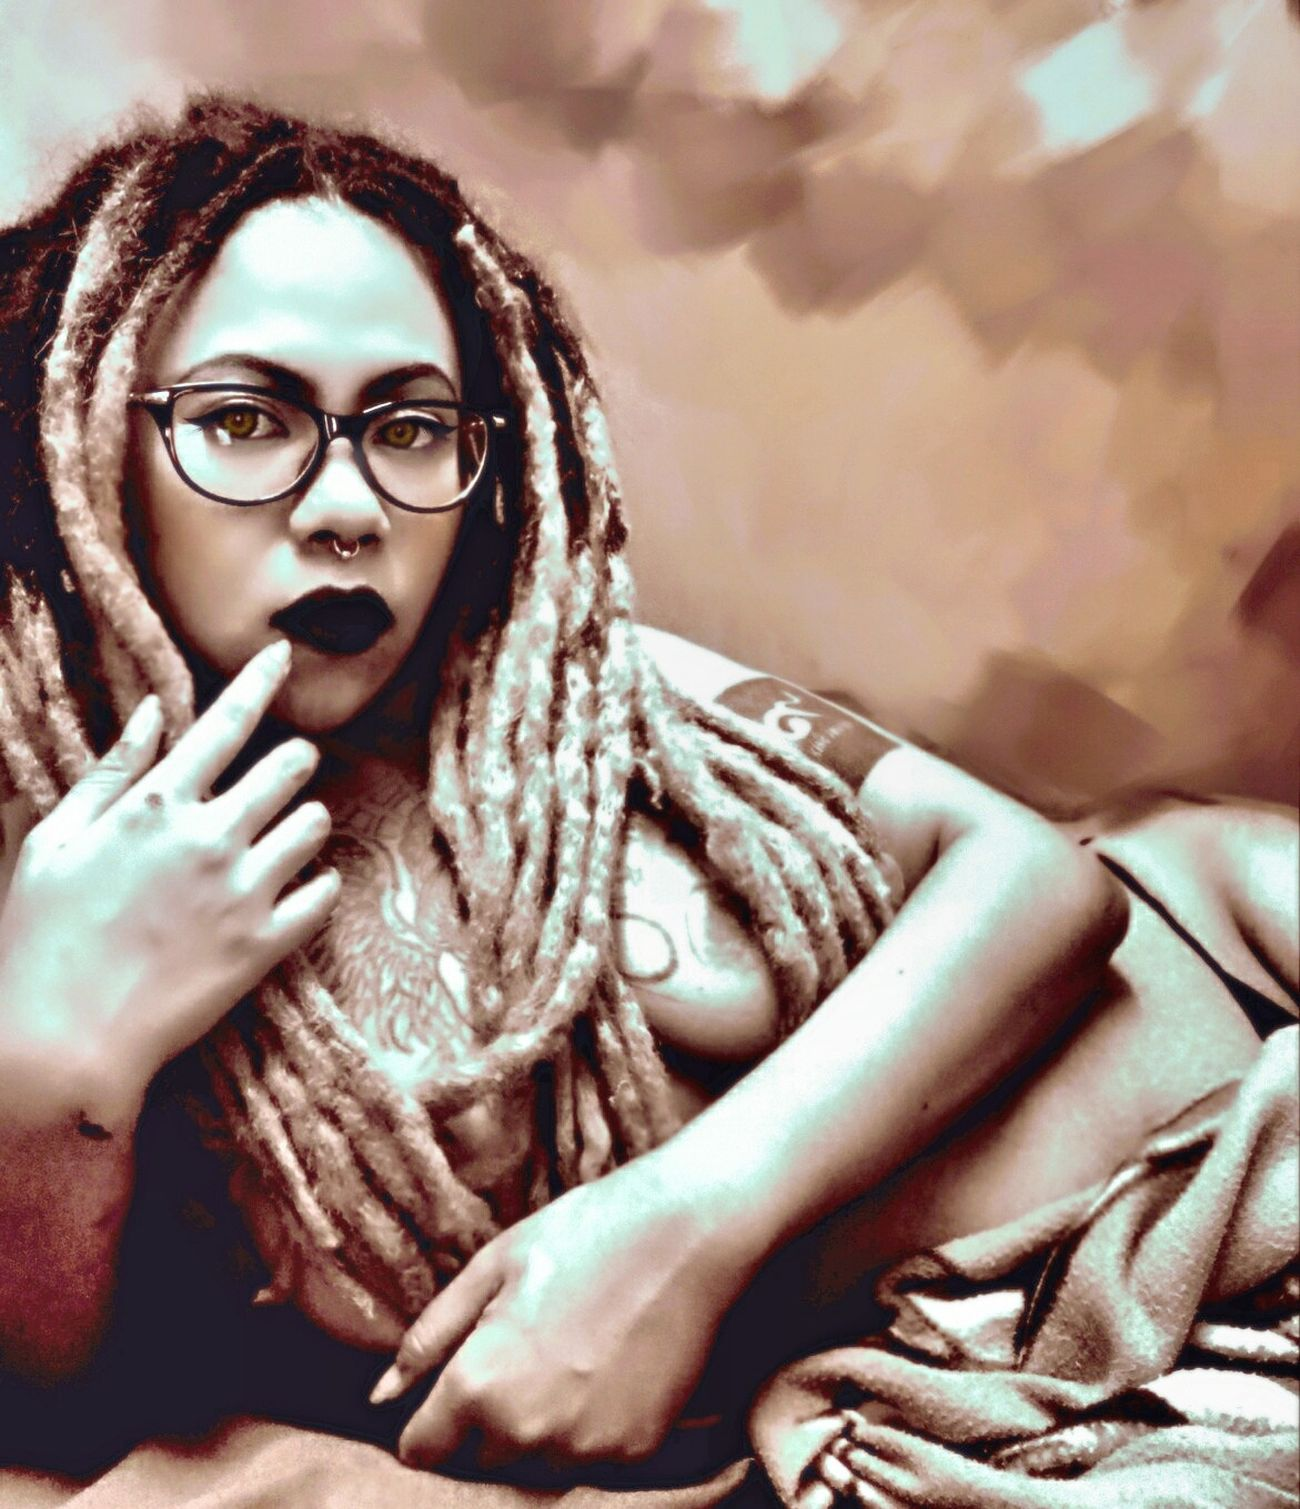 I WANT YOU TO NOTICE WHEN I'M NOT AROUND. Only Women Portrait Women Looking At Camera Tattoos Dreadlocks Crazygirl Girlwithtattoos  Dreadlocks Girl Sexyasiangirl Girlwithtattoos  First Eyeem Photo ThatsMe Thailand Thaigirls Enjoying Life Art Model Shootphoto Aliennam 👽👽👽